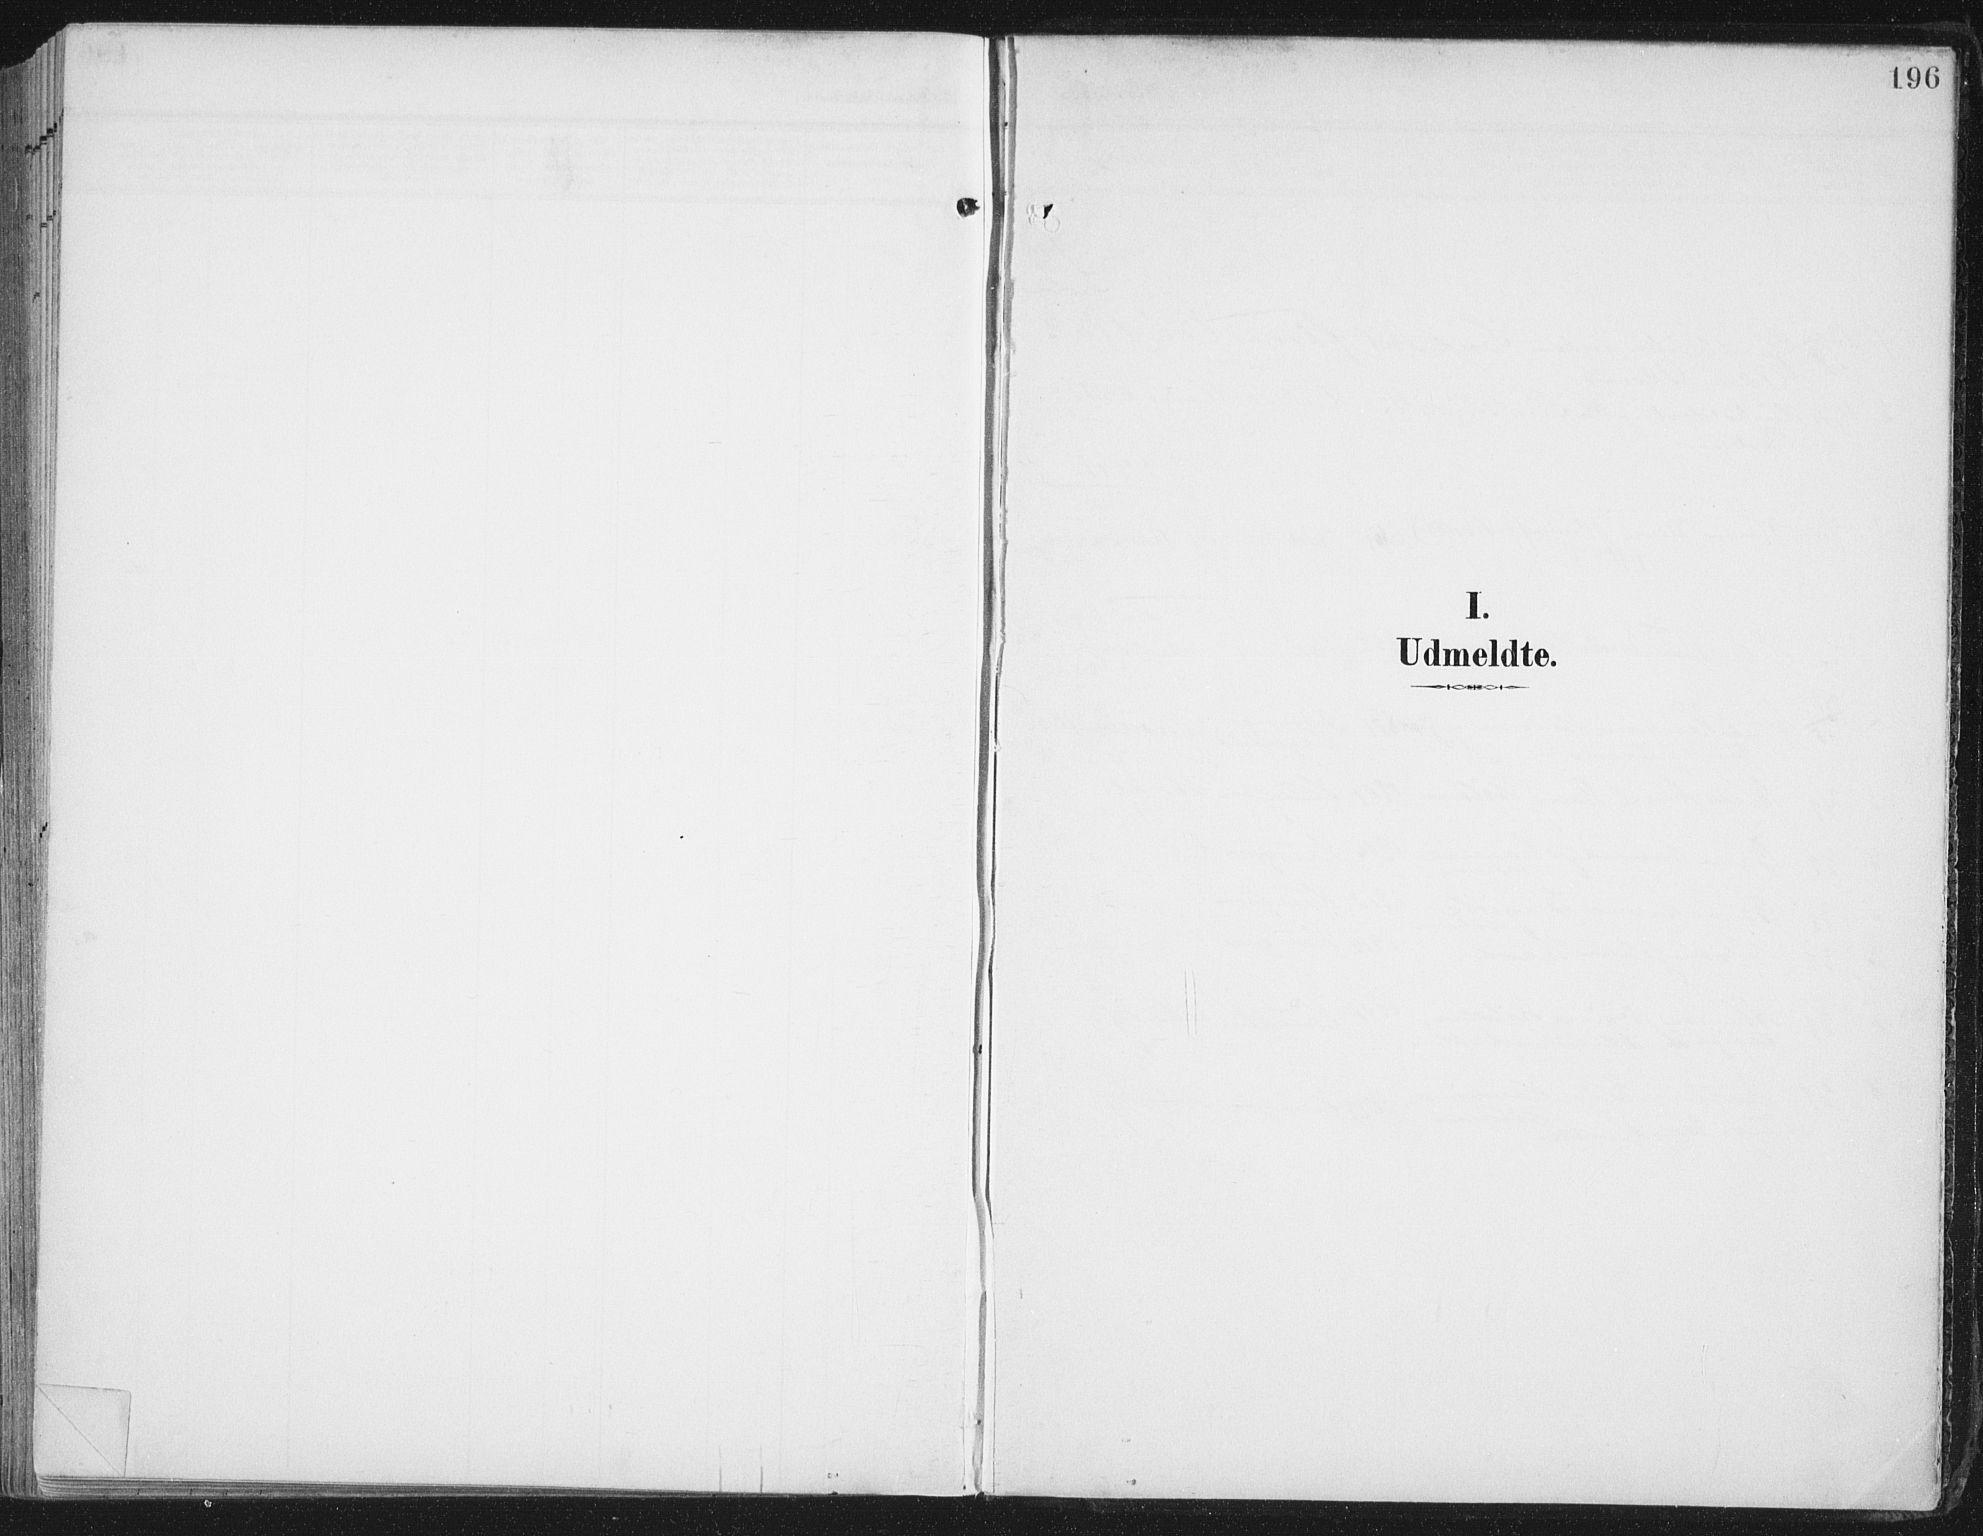 SAT, Ministerialprotokoller, klokkerbøker og fødselsregistre - Nordland, 892/L1321: Ministerialbok nr. 892A02, 1902-1918, s. 196